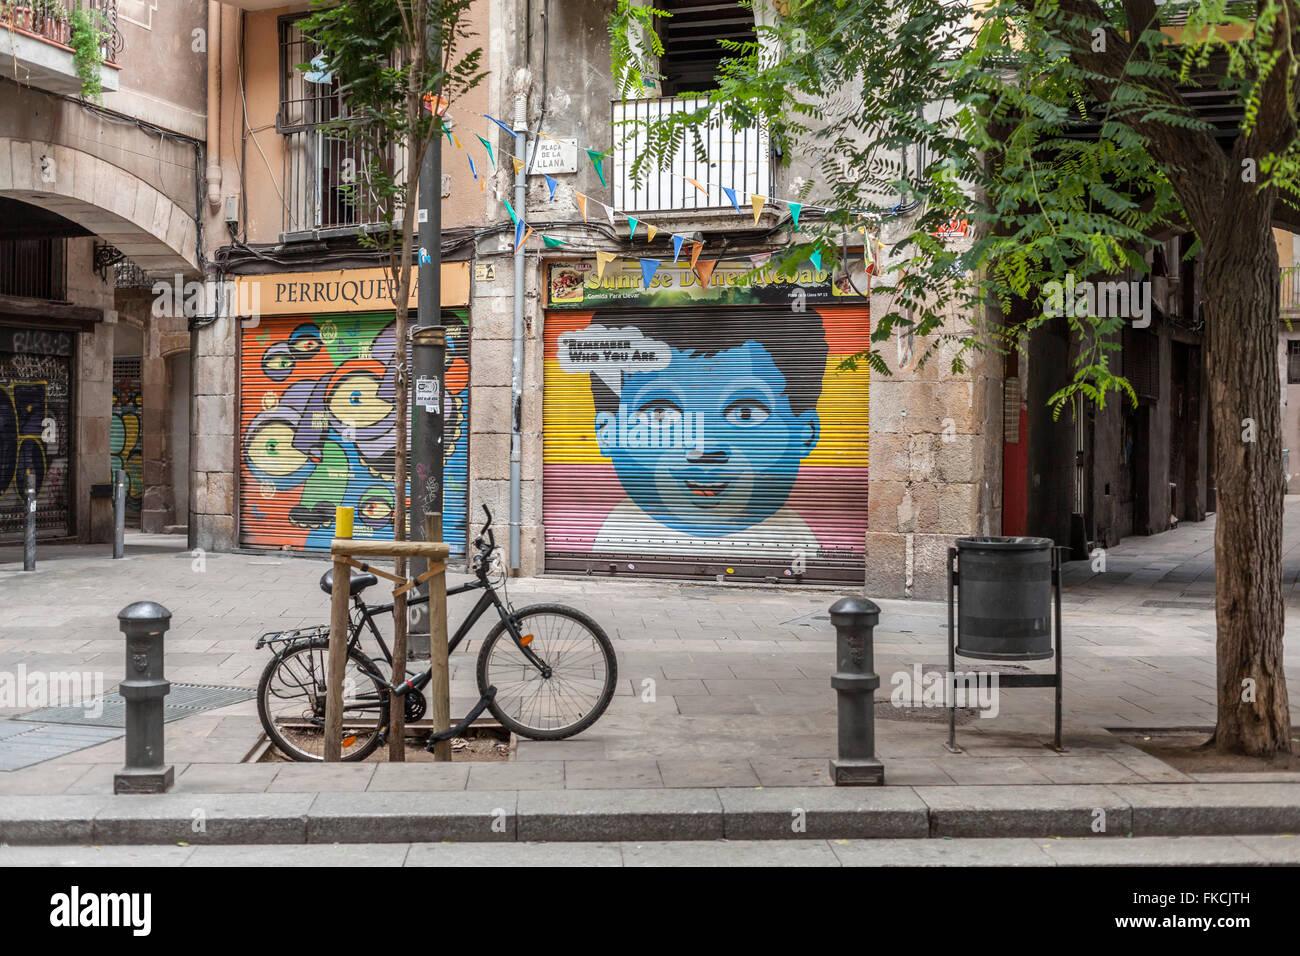 Street view, Ciutat Vella, Barcelona. - Stock Image